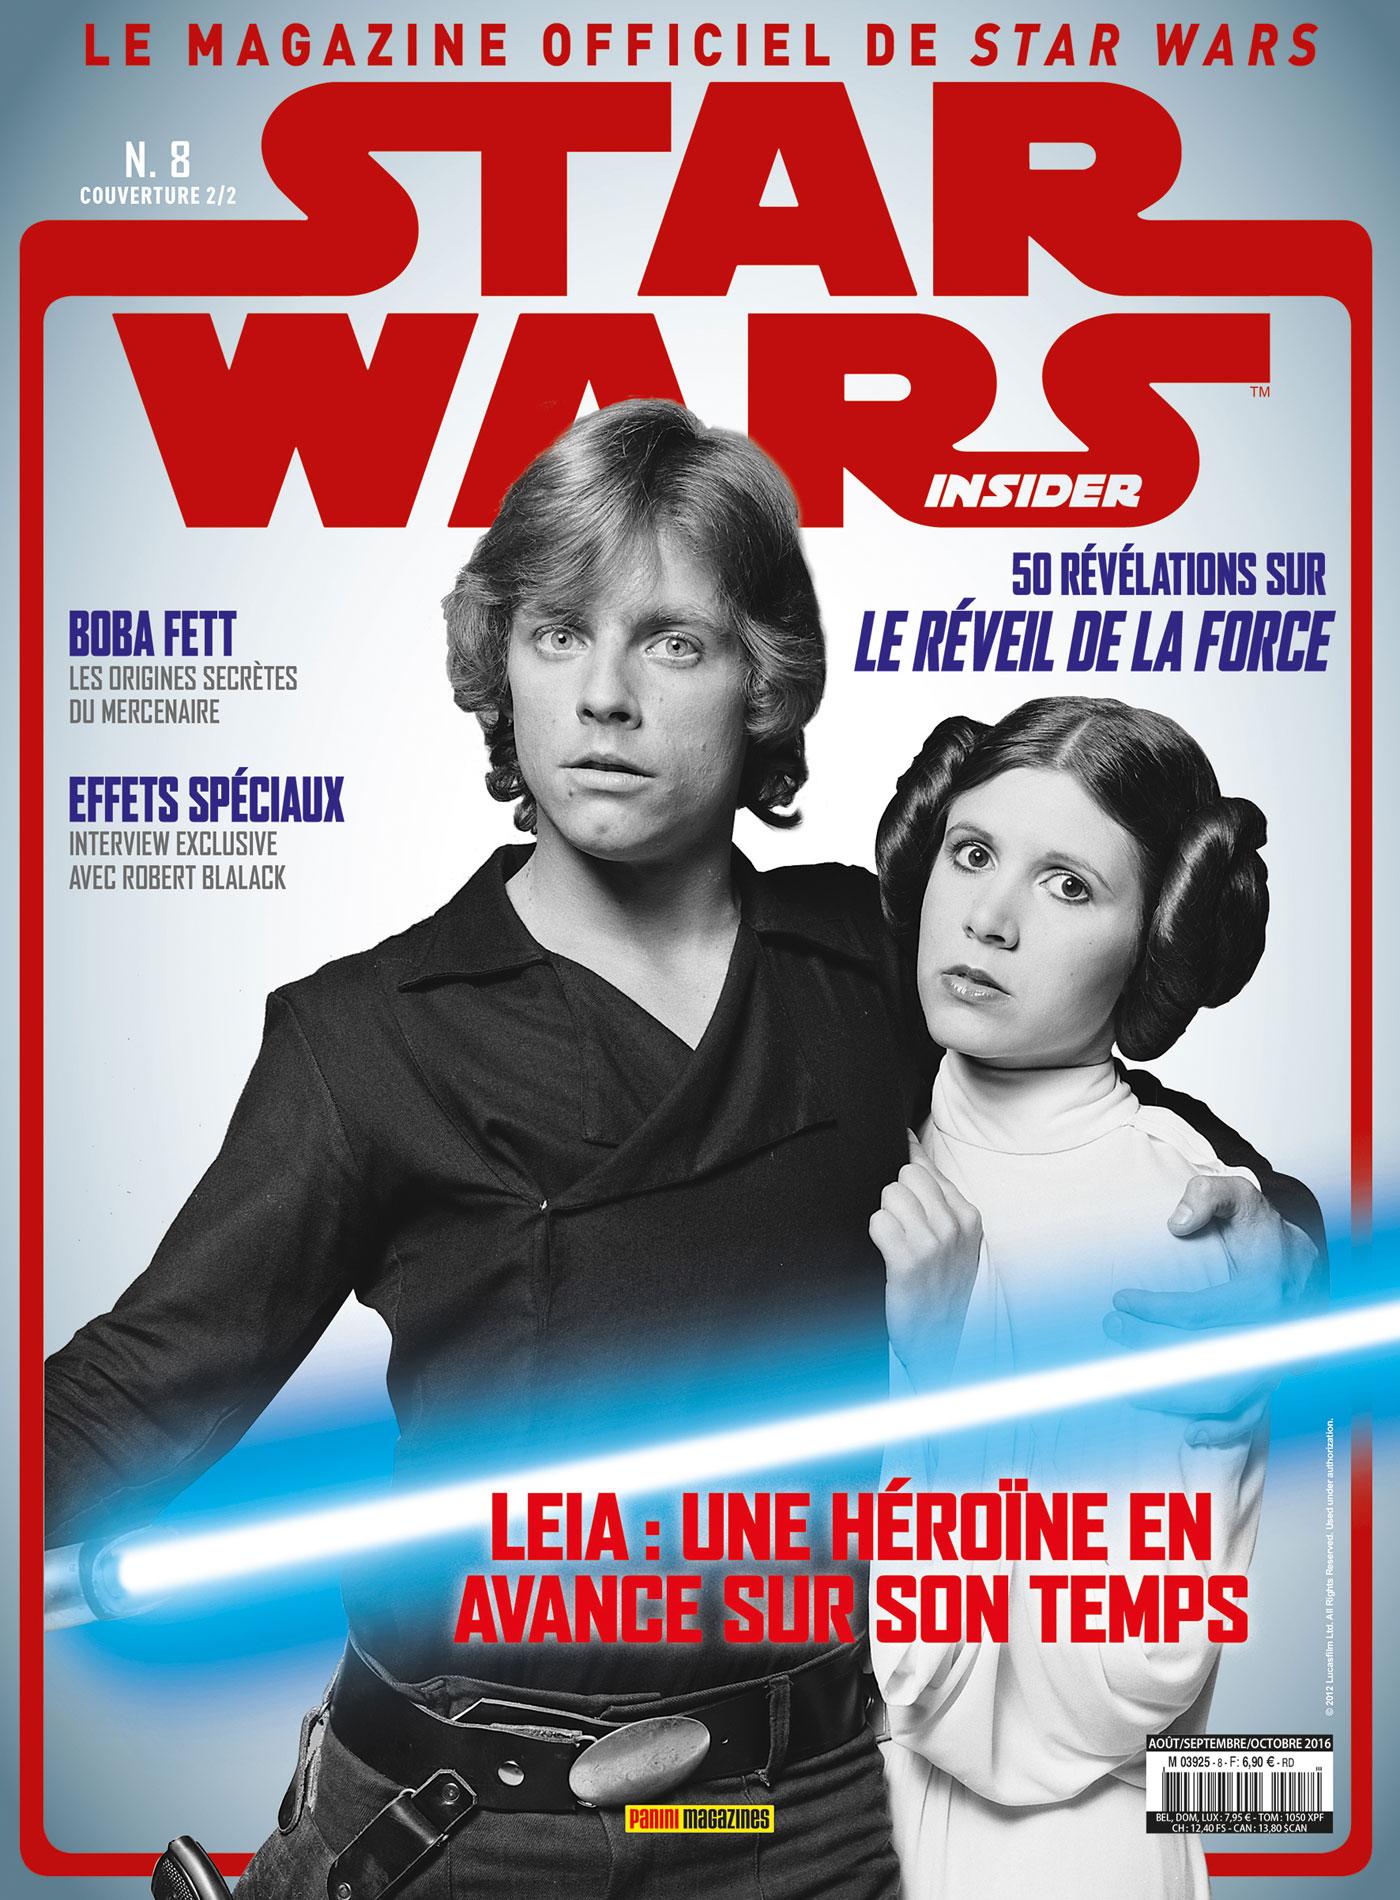 Star Wars Insider 8 - Couverture B